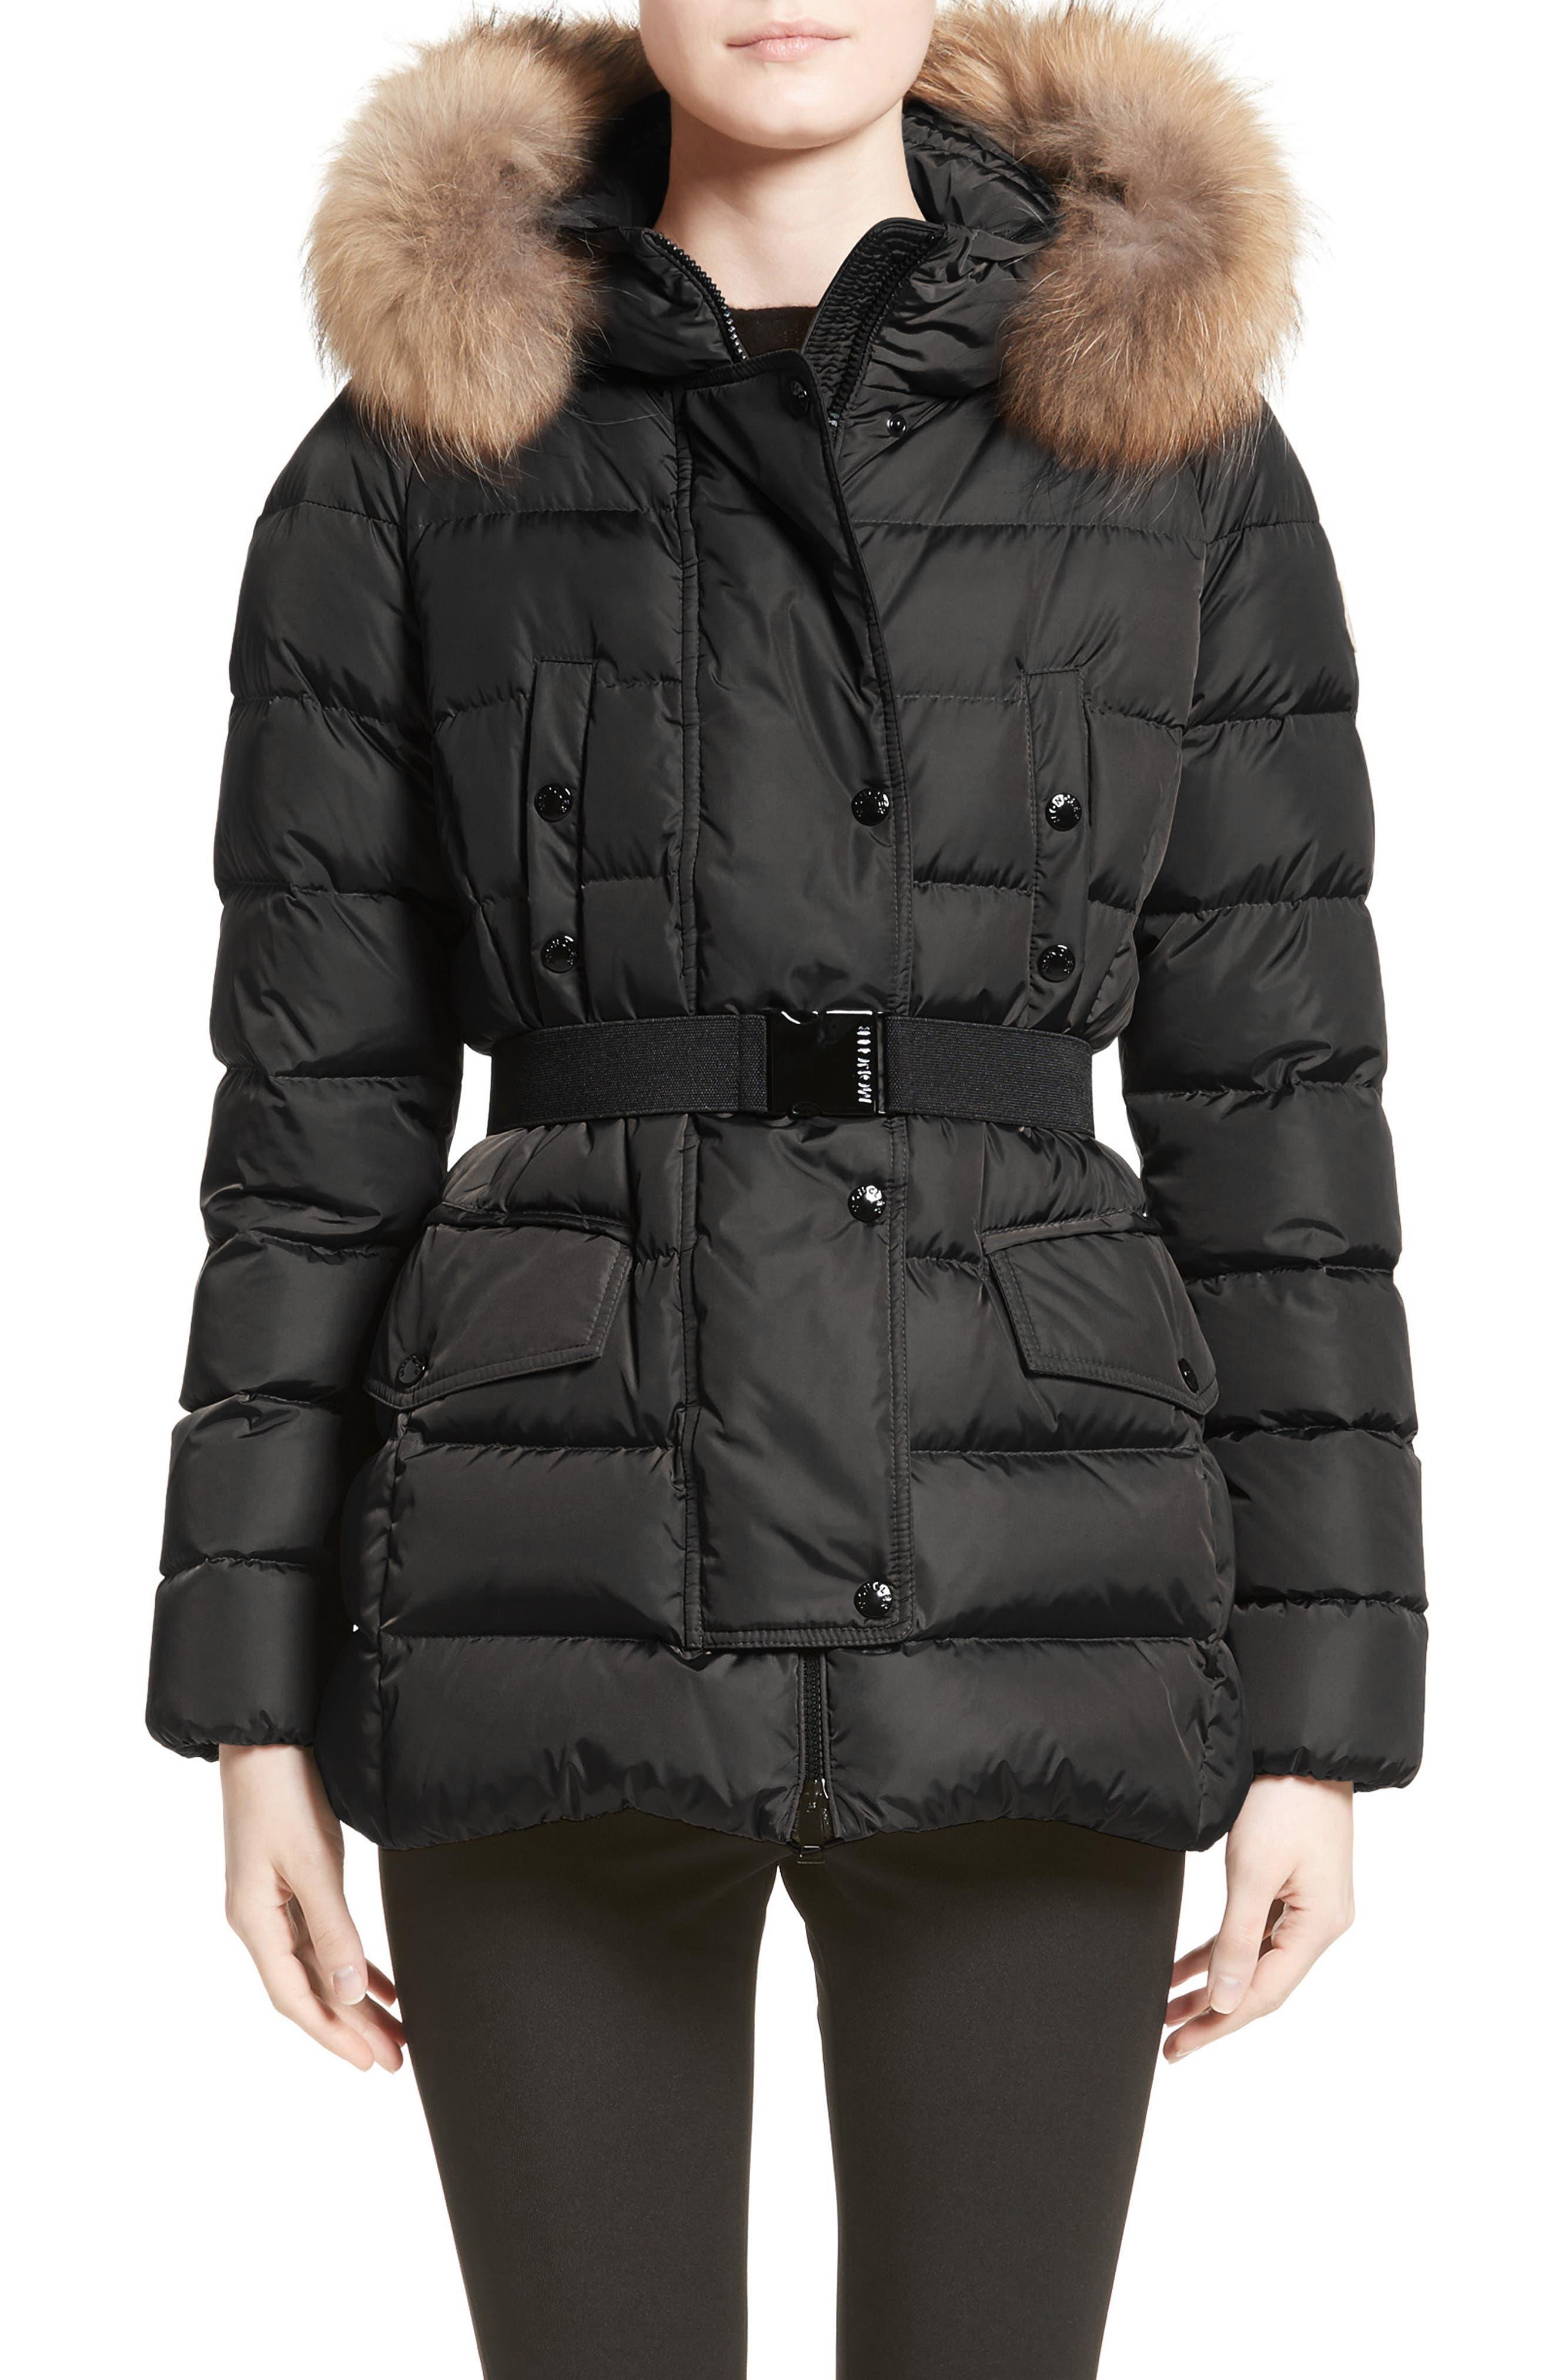 Moncler black coat with fur